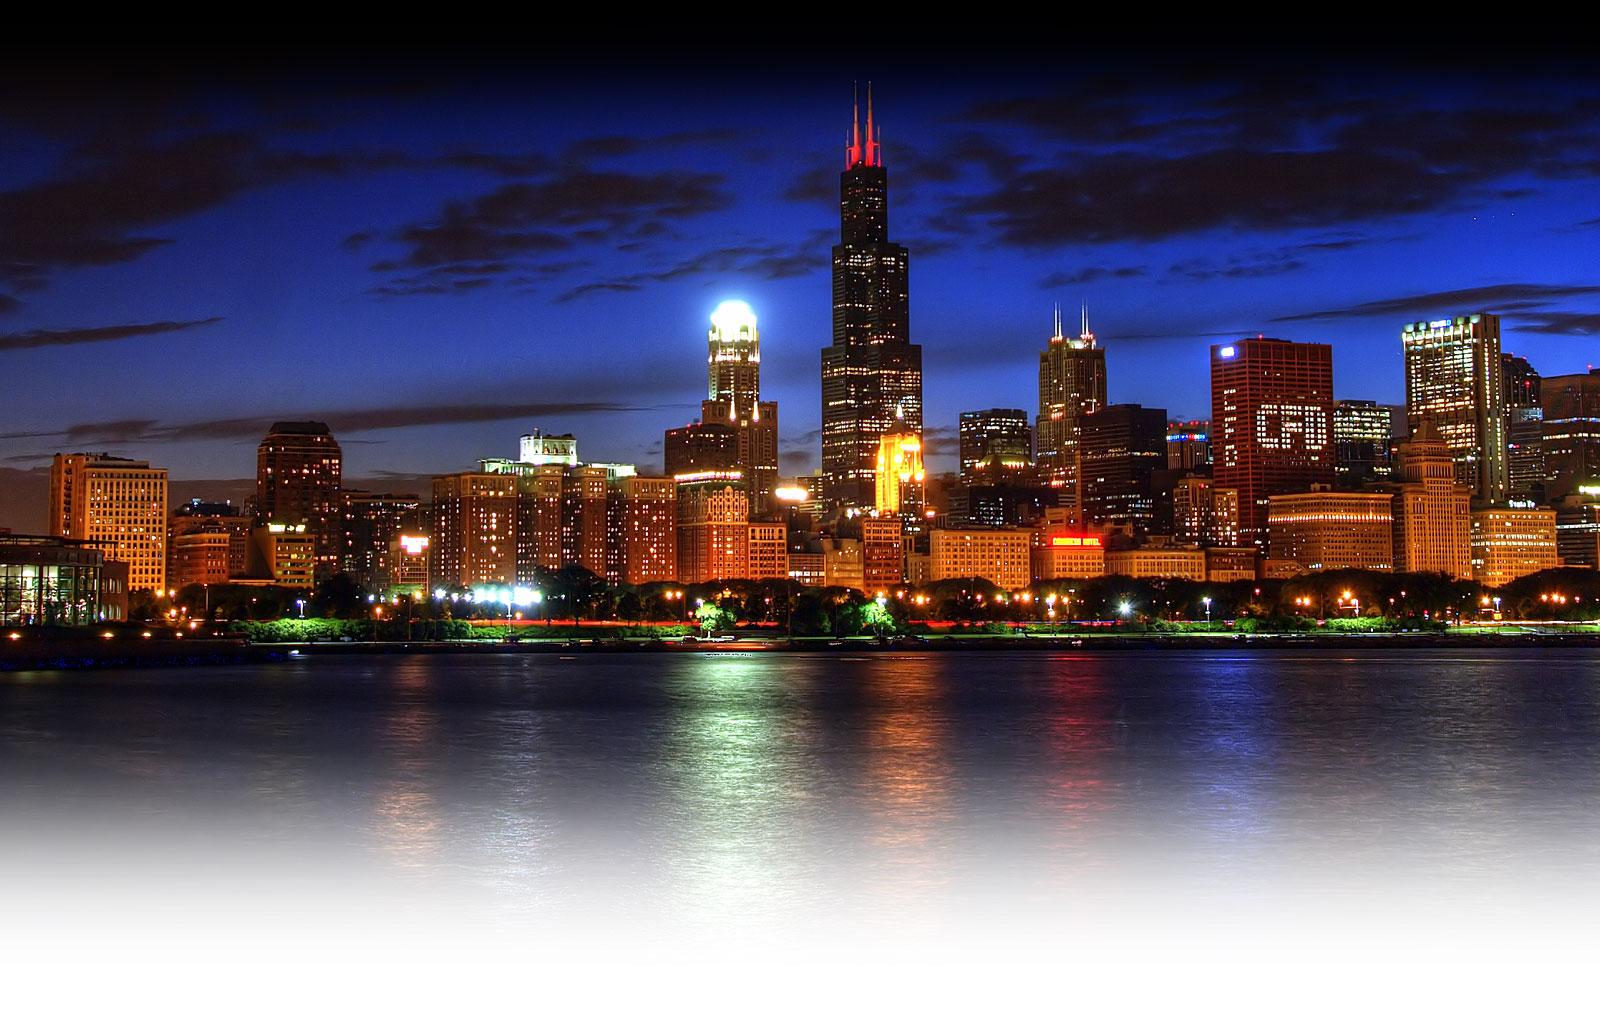 Chicago night skyline wallpaper wallpapersafari - Skyline night wallpaper ...